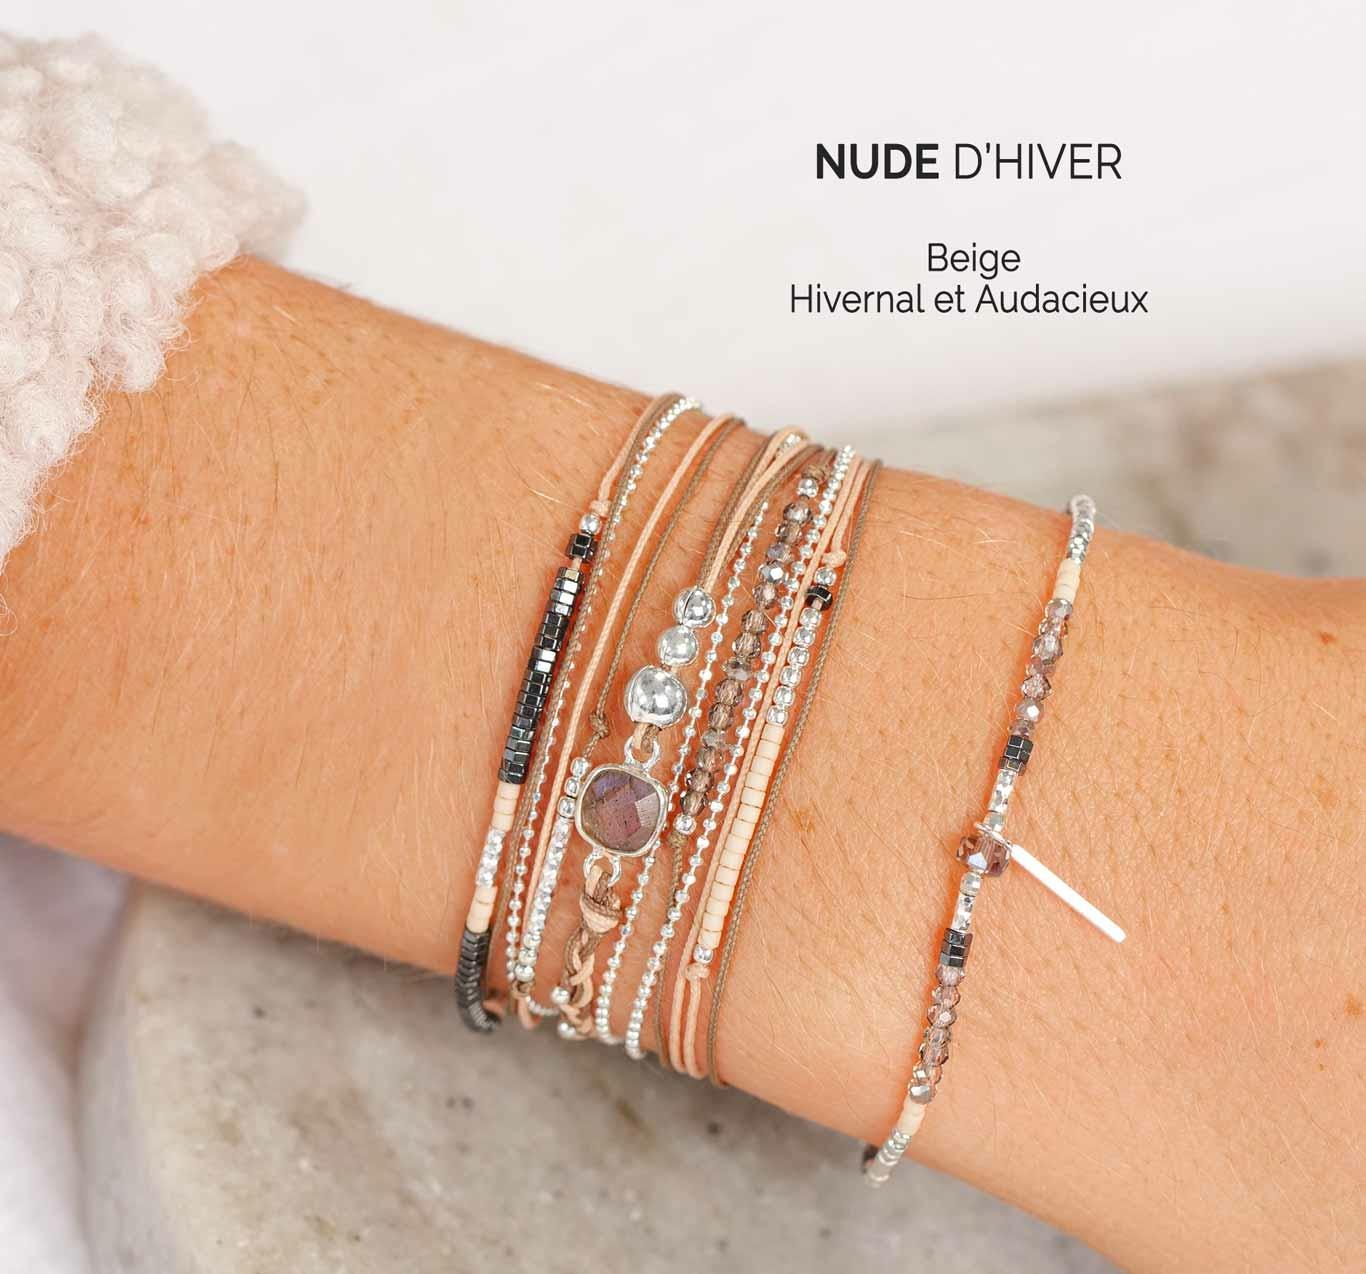 Bandeaux-Collection-NUDE-D'HIVER-2